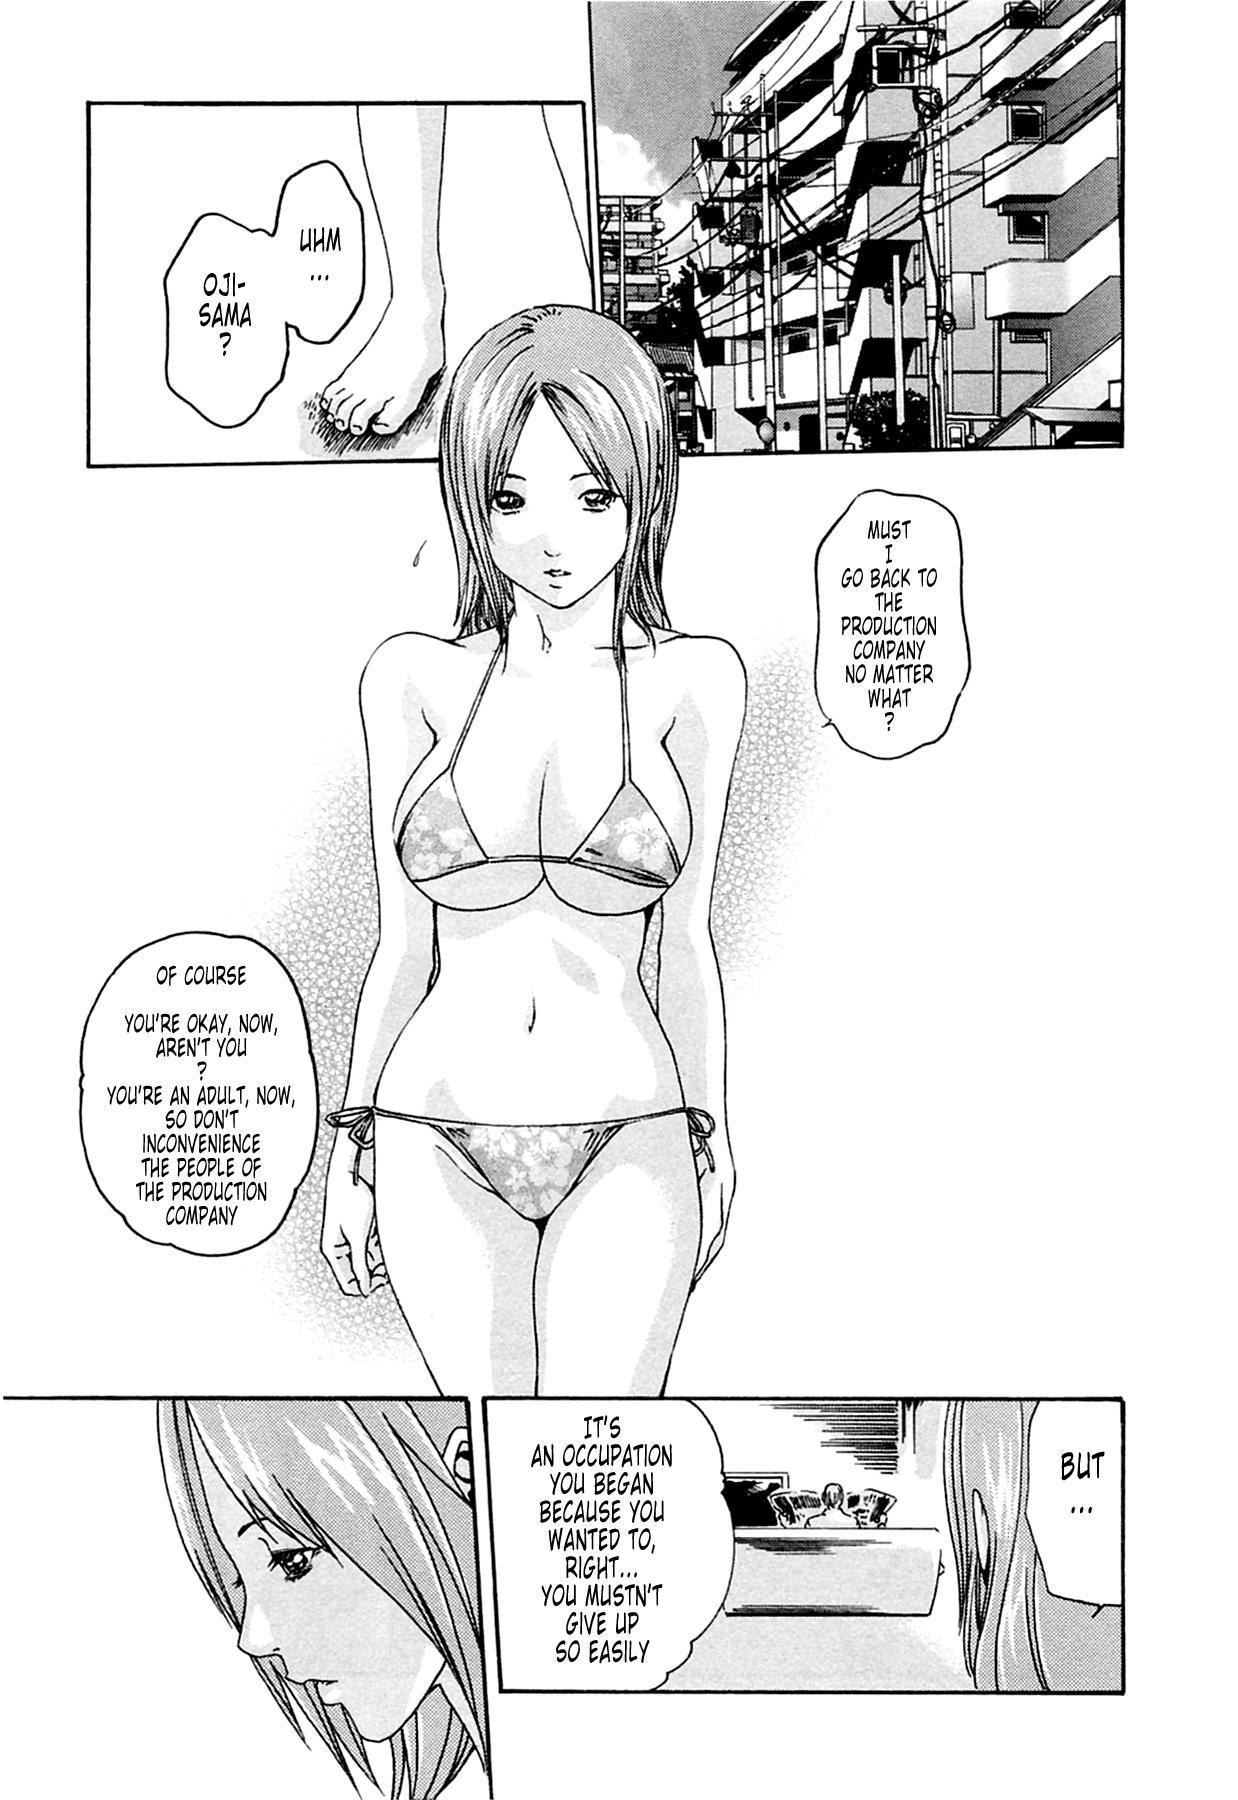 [Haruki] Kisei Juui Suzune (Parasite Doctor Suzune) Vol.02 - CH10-11 36